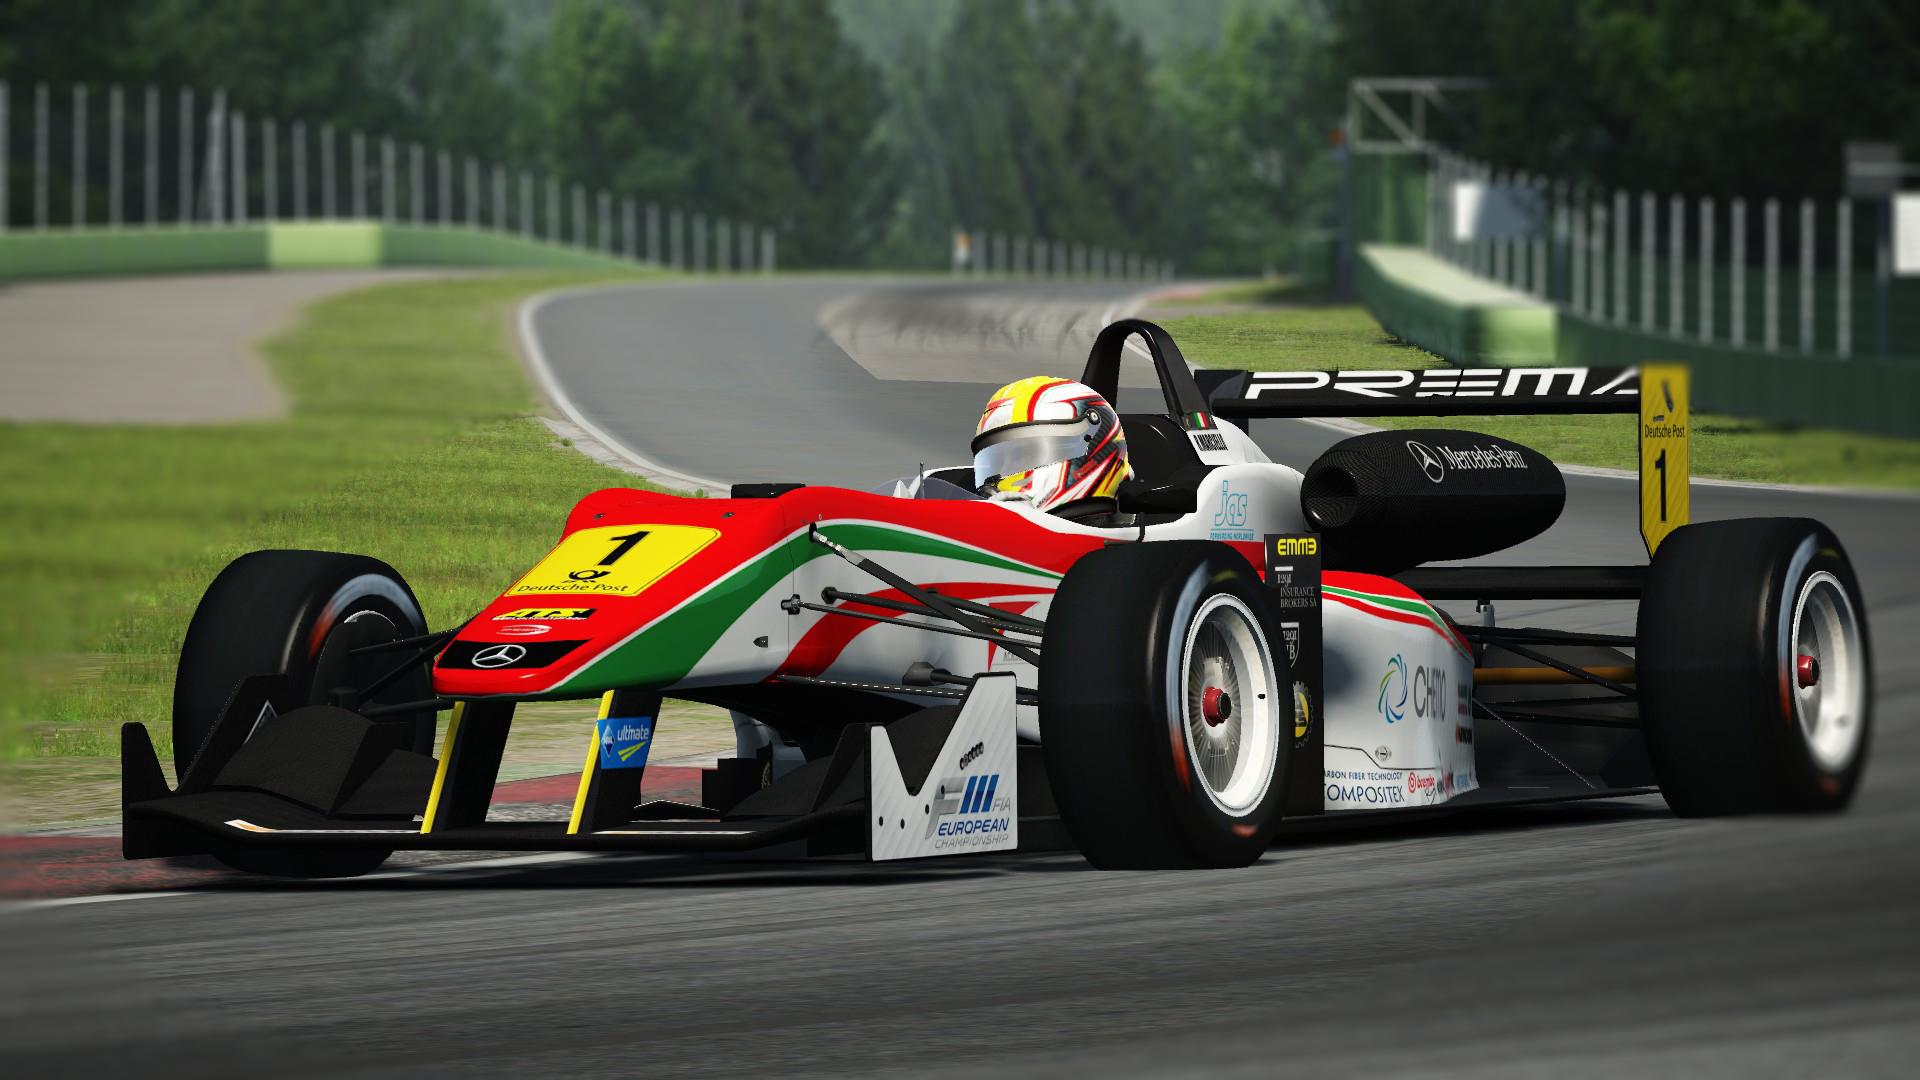 RSR Formula Three Mod - Assetto Corsa 3.jpg